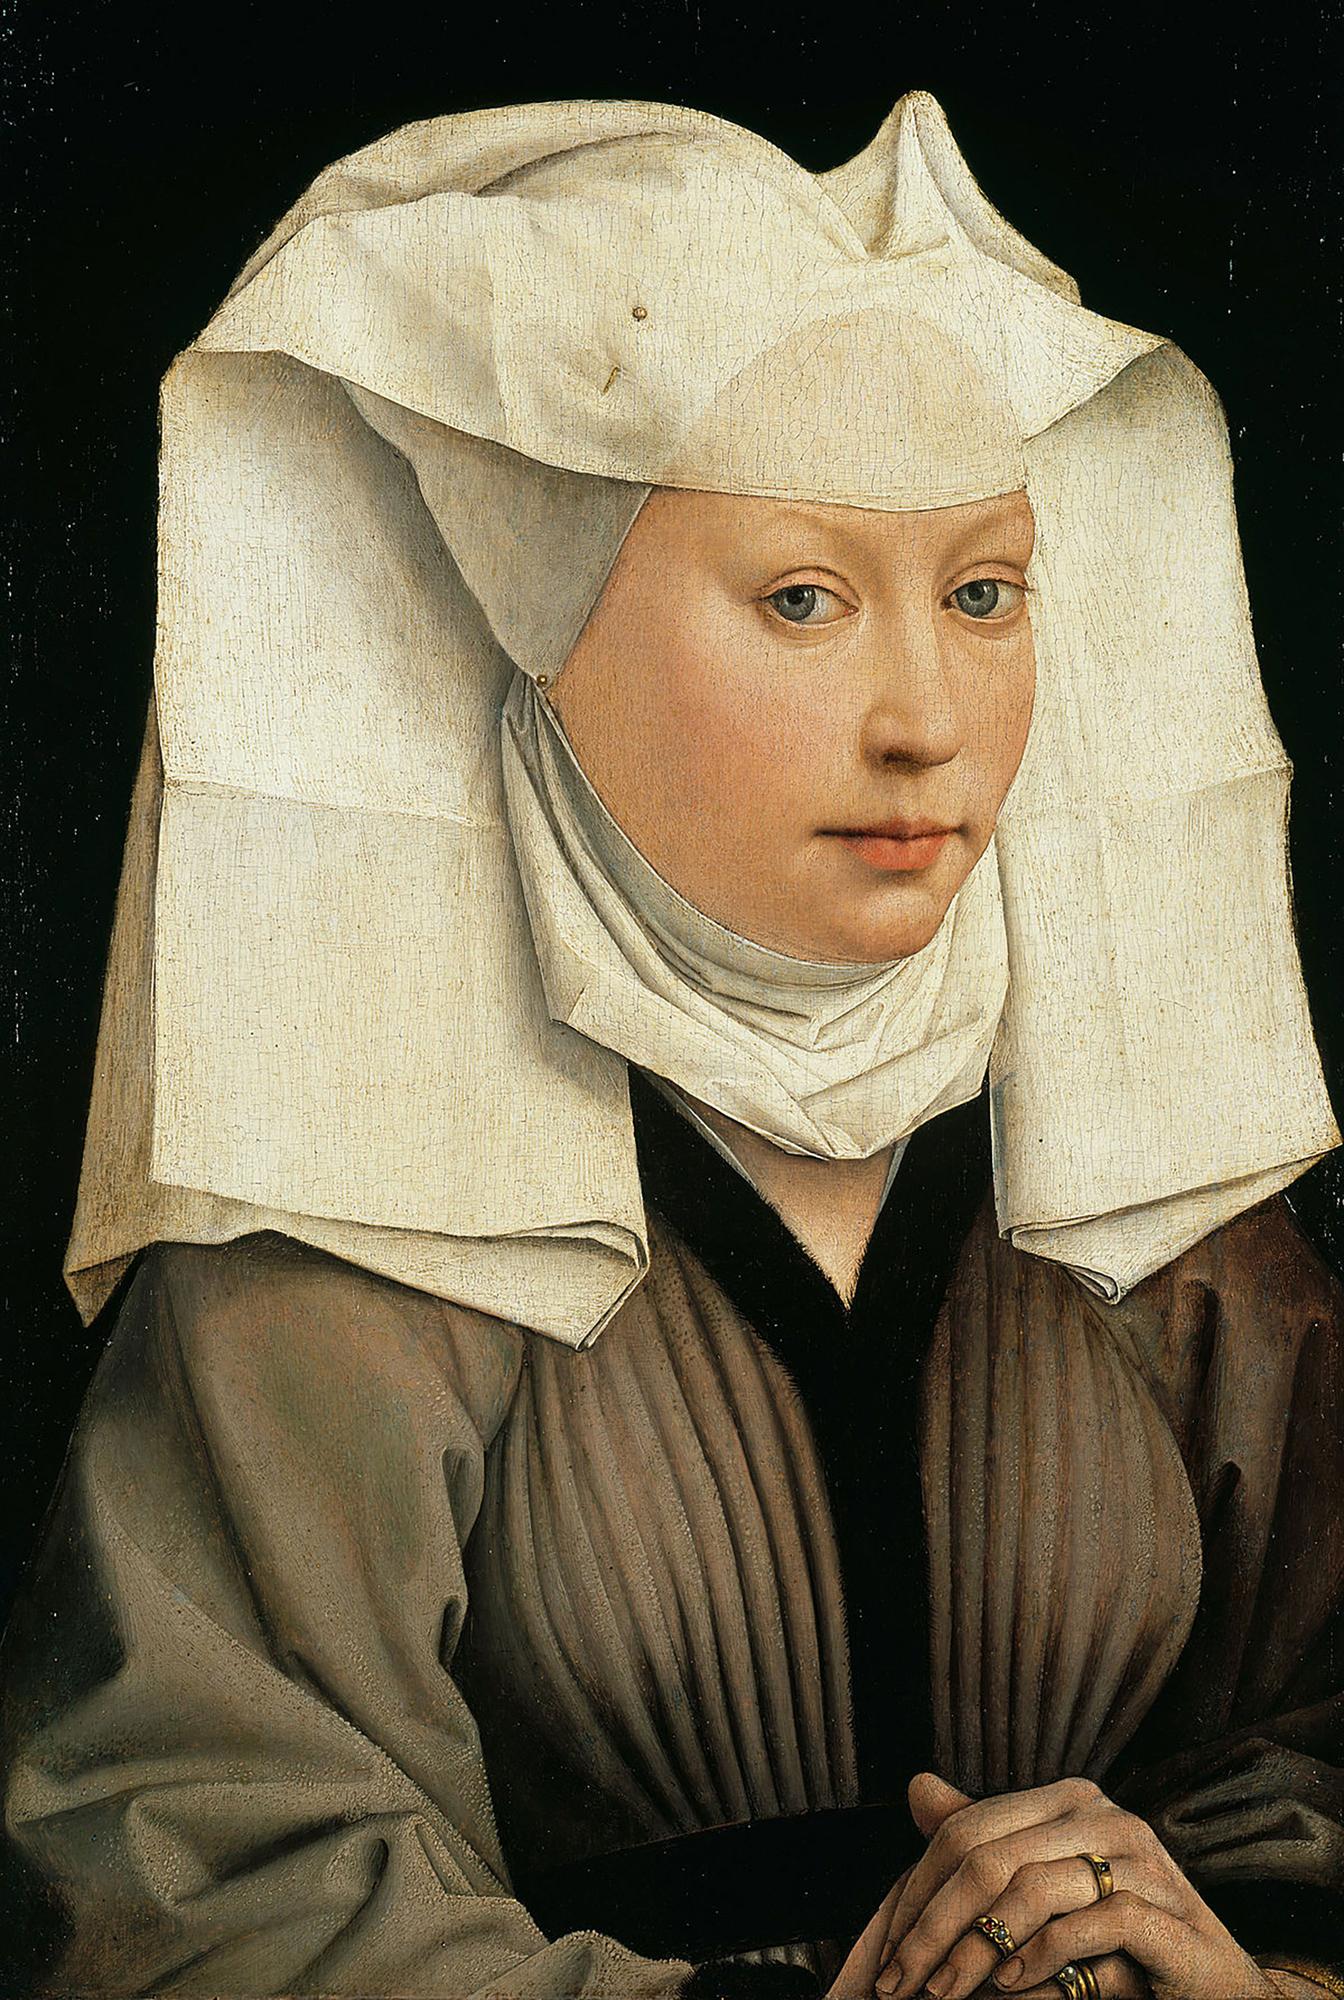 Portrait of a Woman with a Winged Bonnet -Rogier van der Weyden, 1435